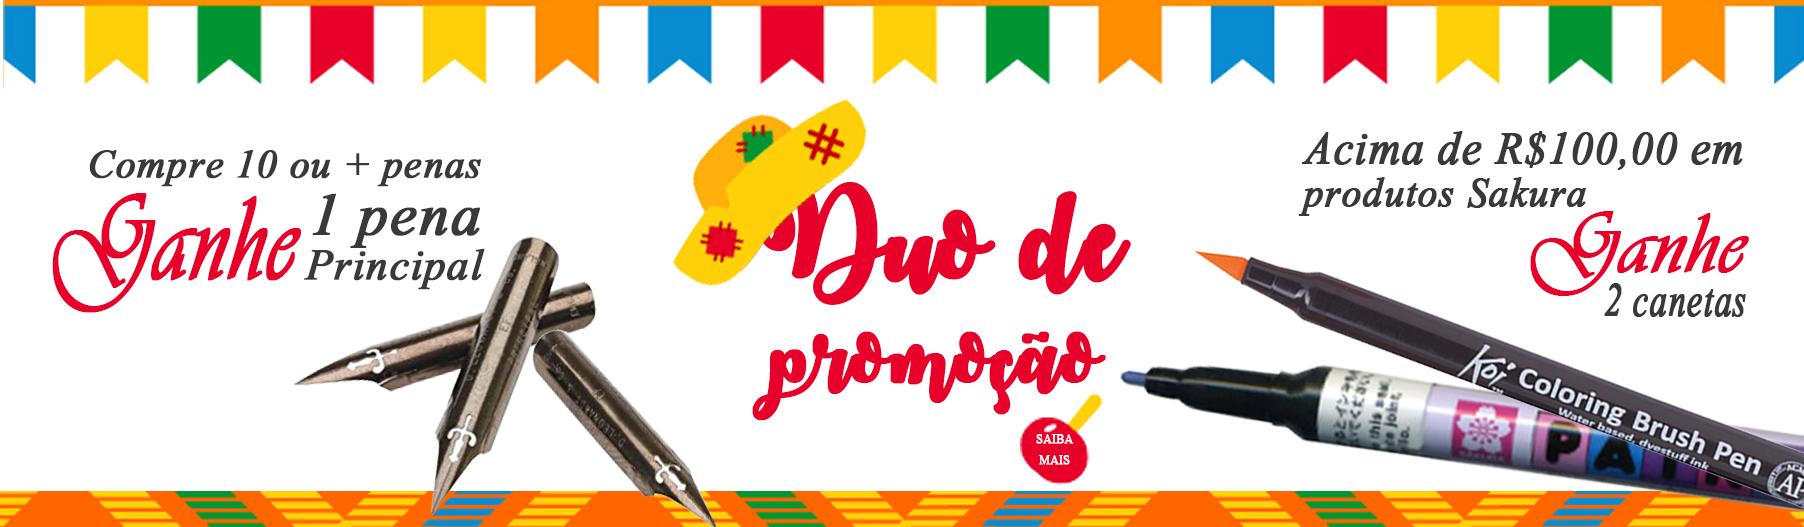 DUO PROMOCAO 2017